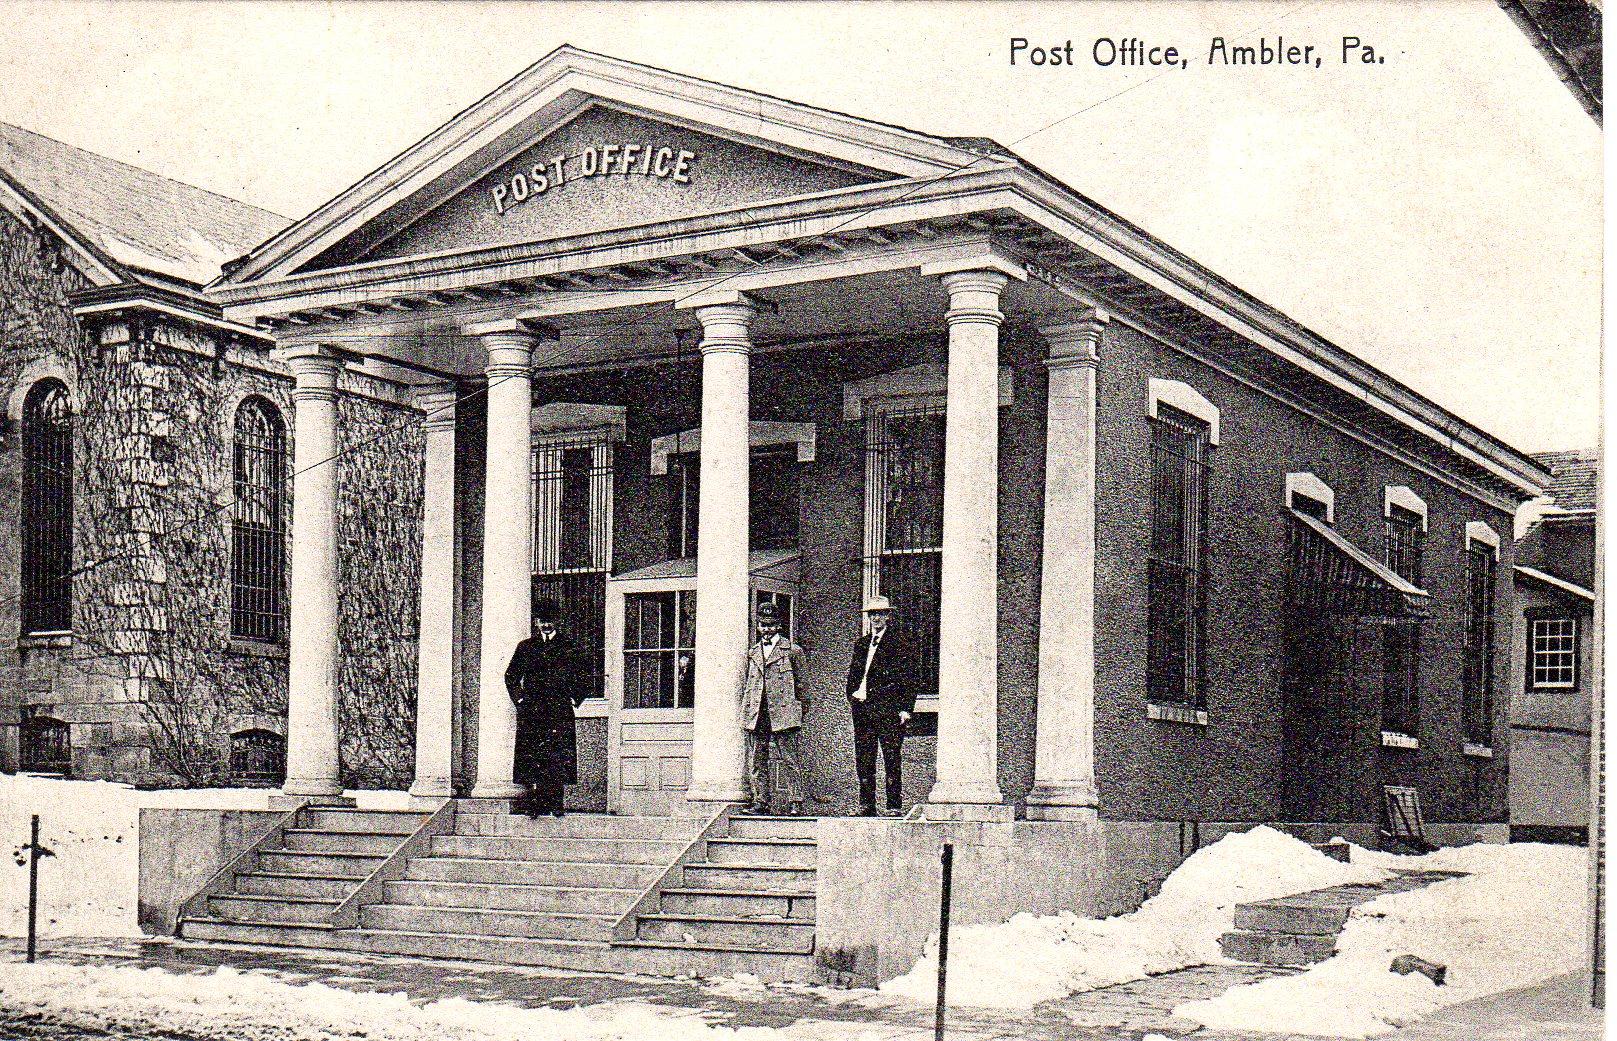 Post Card Collection (E Simon)_2682_59_Post Office, Ambler, Pa_24 Aug 1908